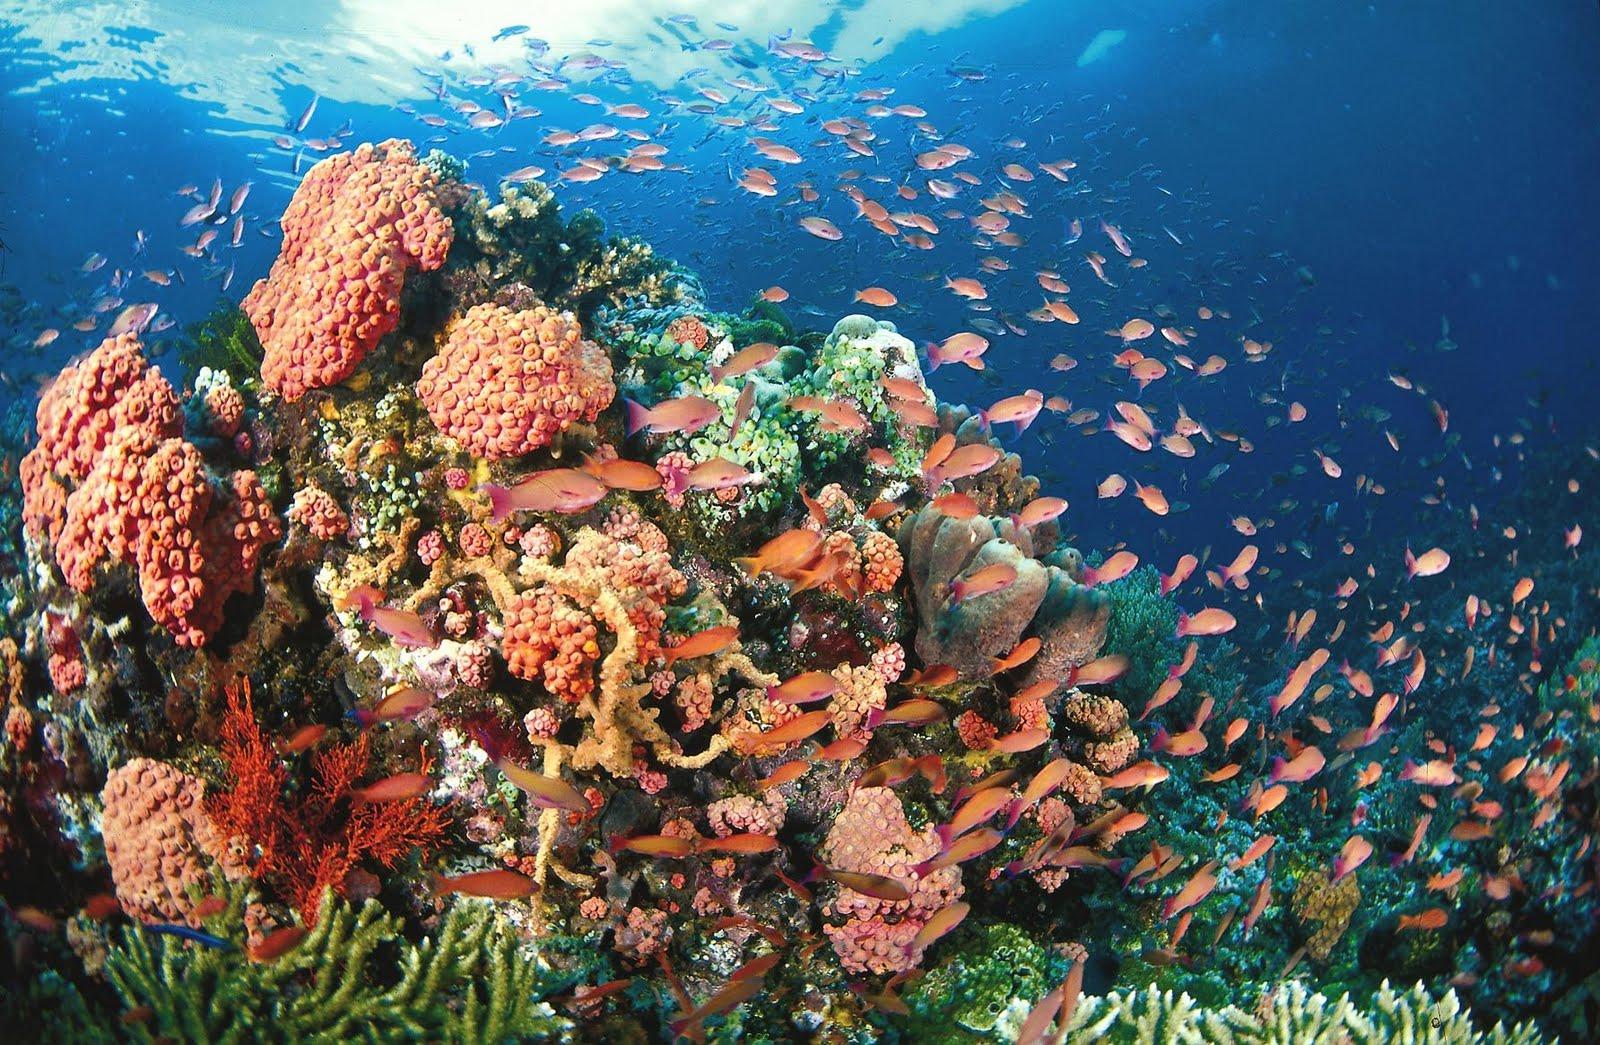 Corals Anilao Batangas Scuba Diving | Dive Travel Philippines